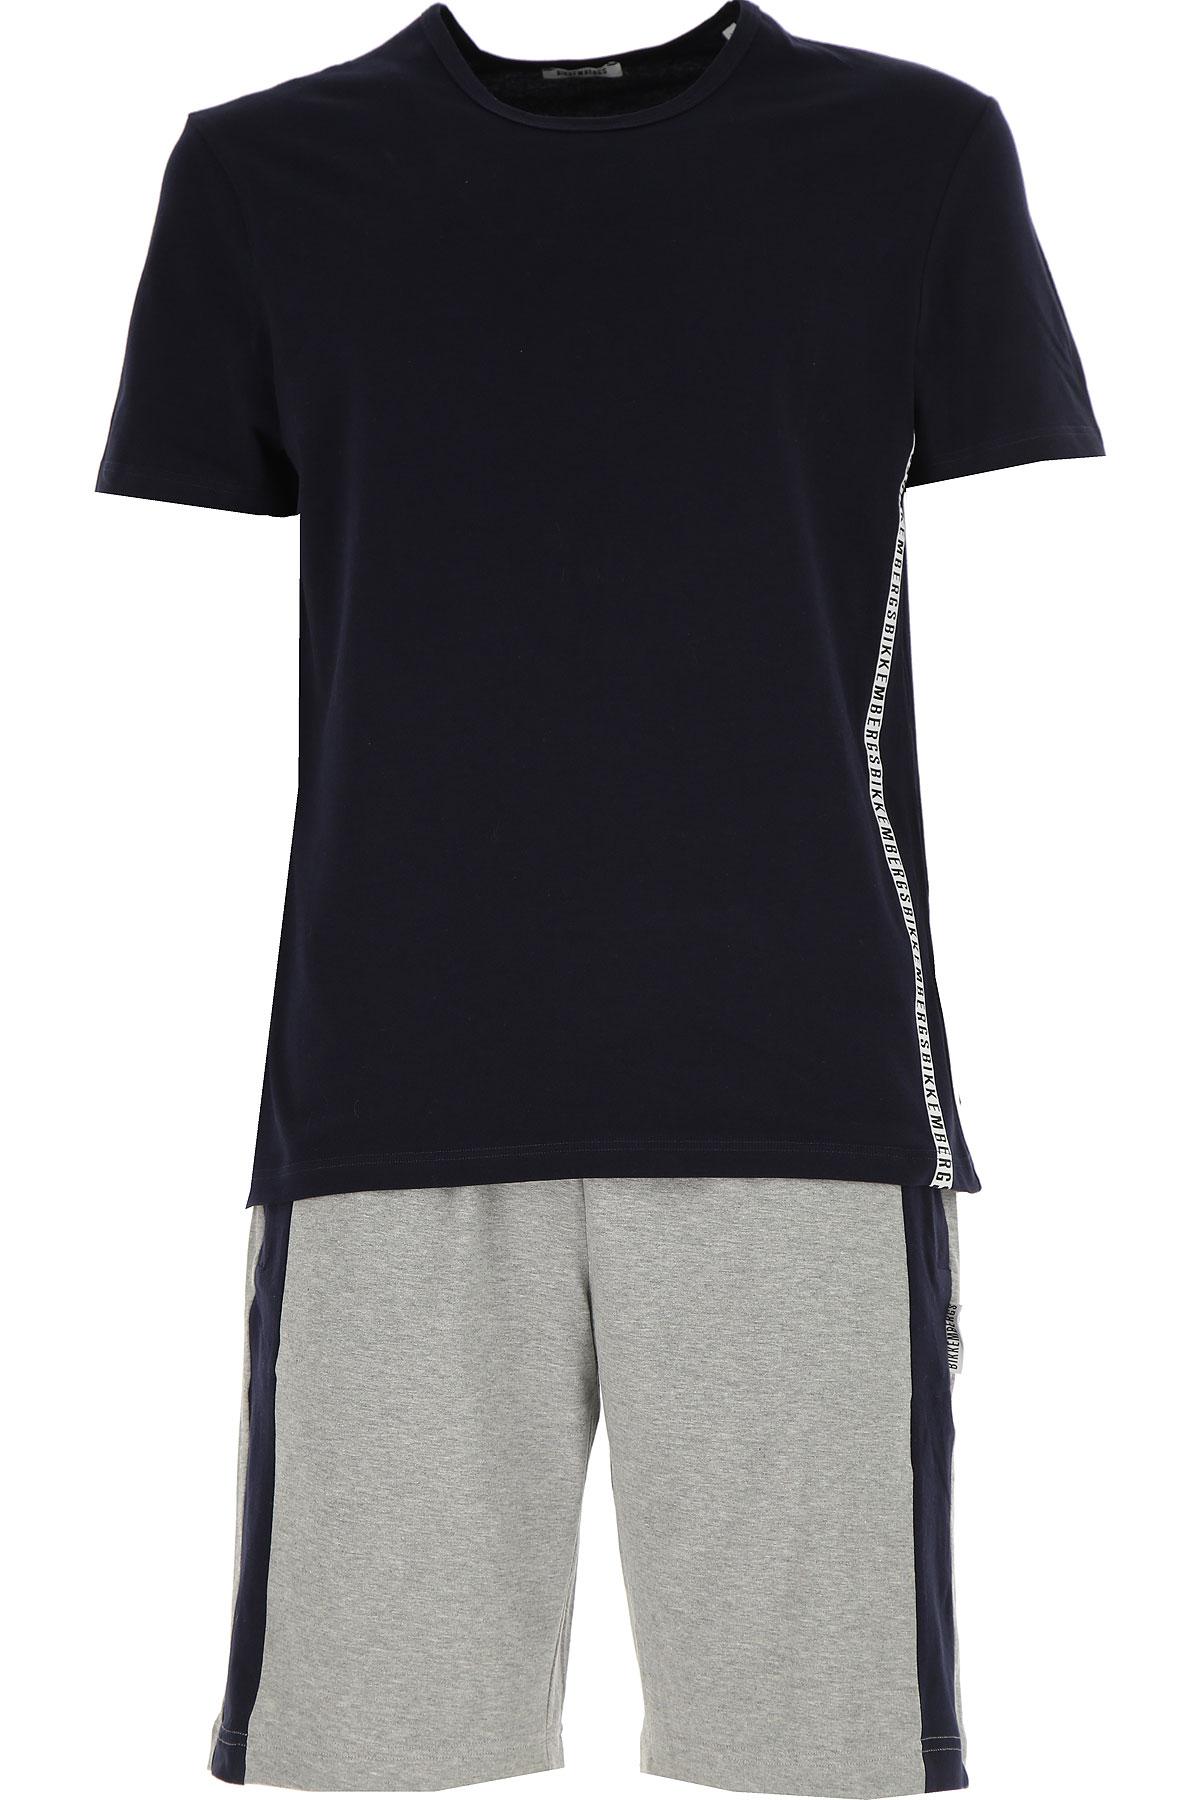 Image of Dirk Bikkembergs Loungewear for Men On Sale, Blue Marine, Cotton, 2017, S (EU 3) M (EU 4)